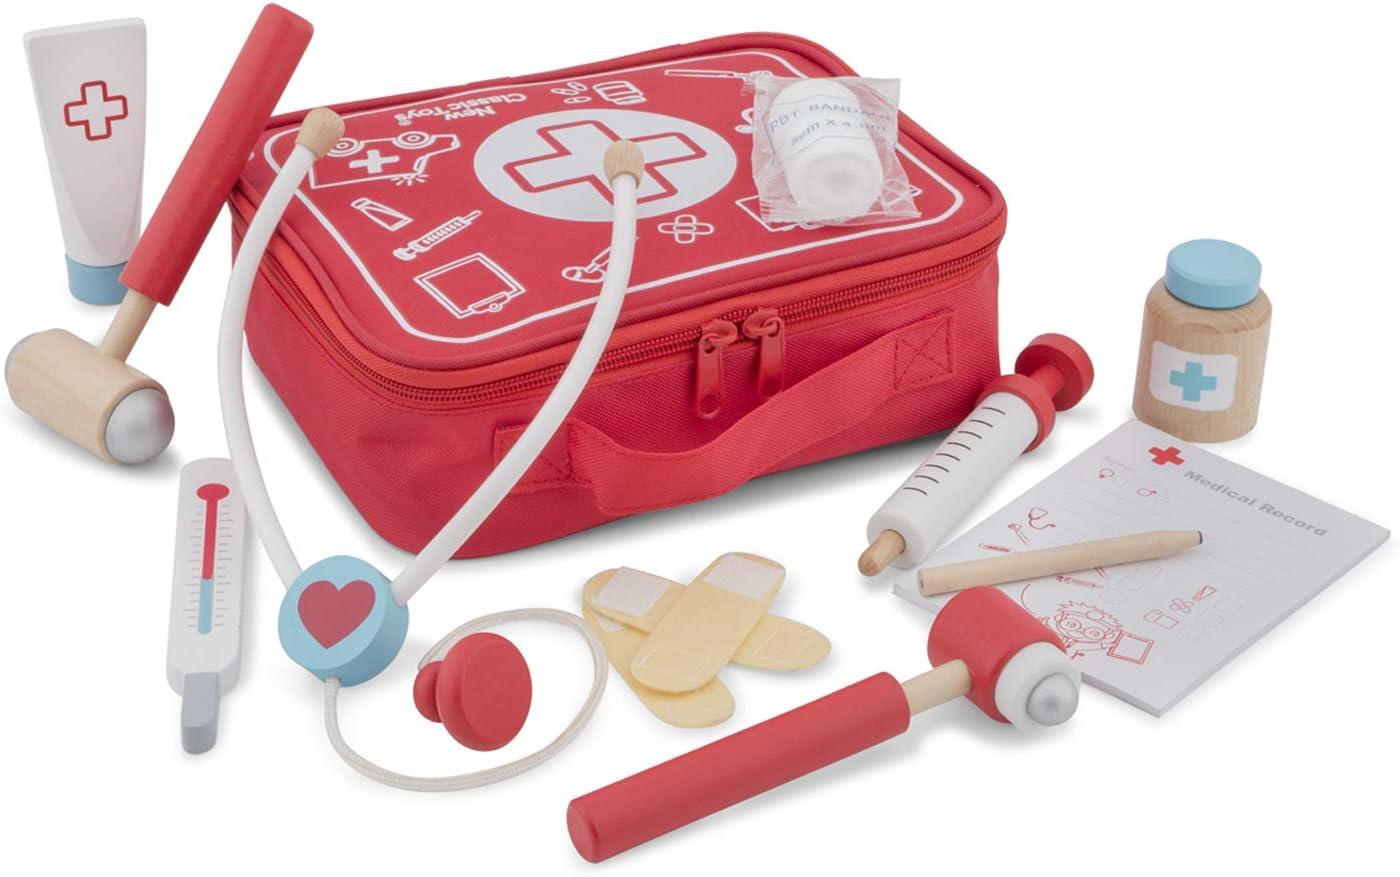 18291 color//modelo surtido New Classic Toys Doctor set